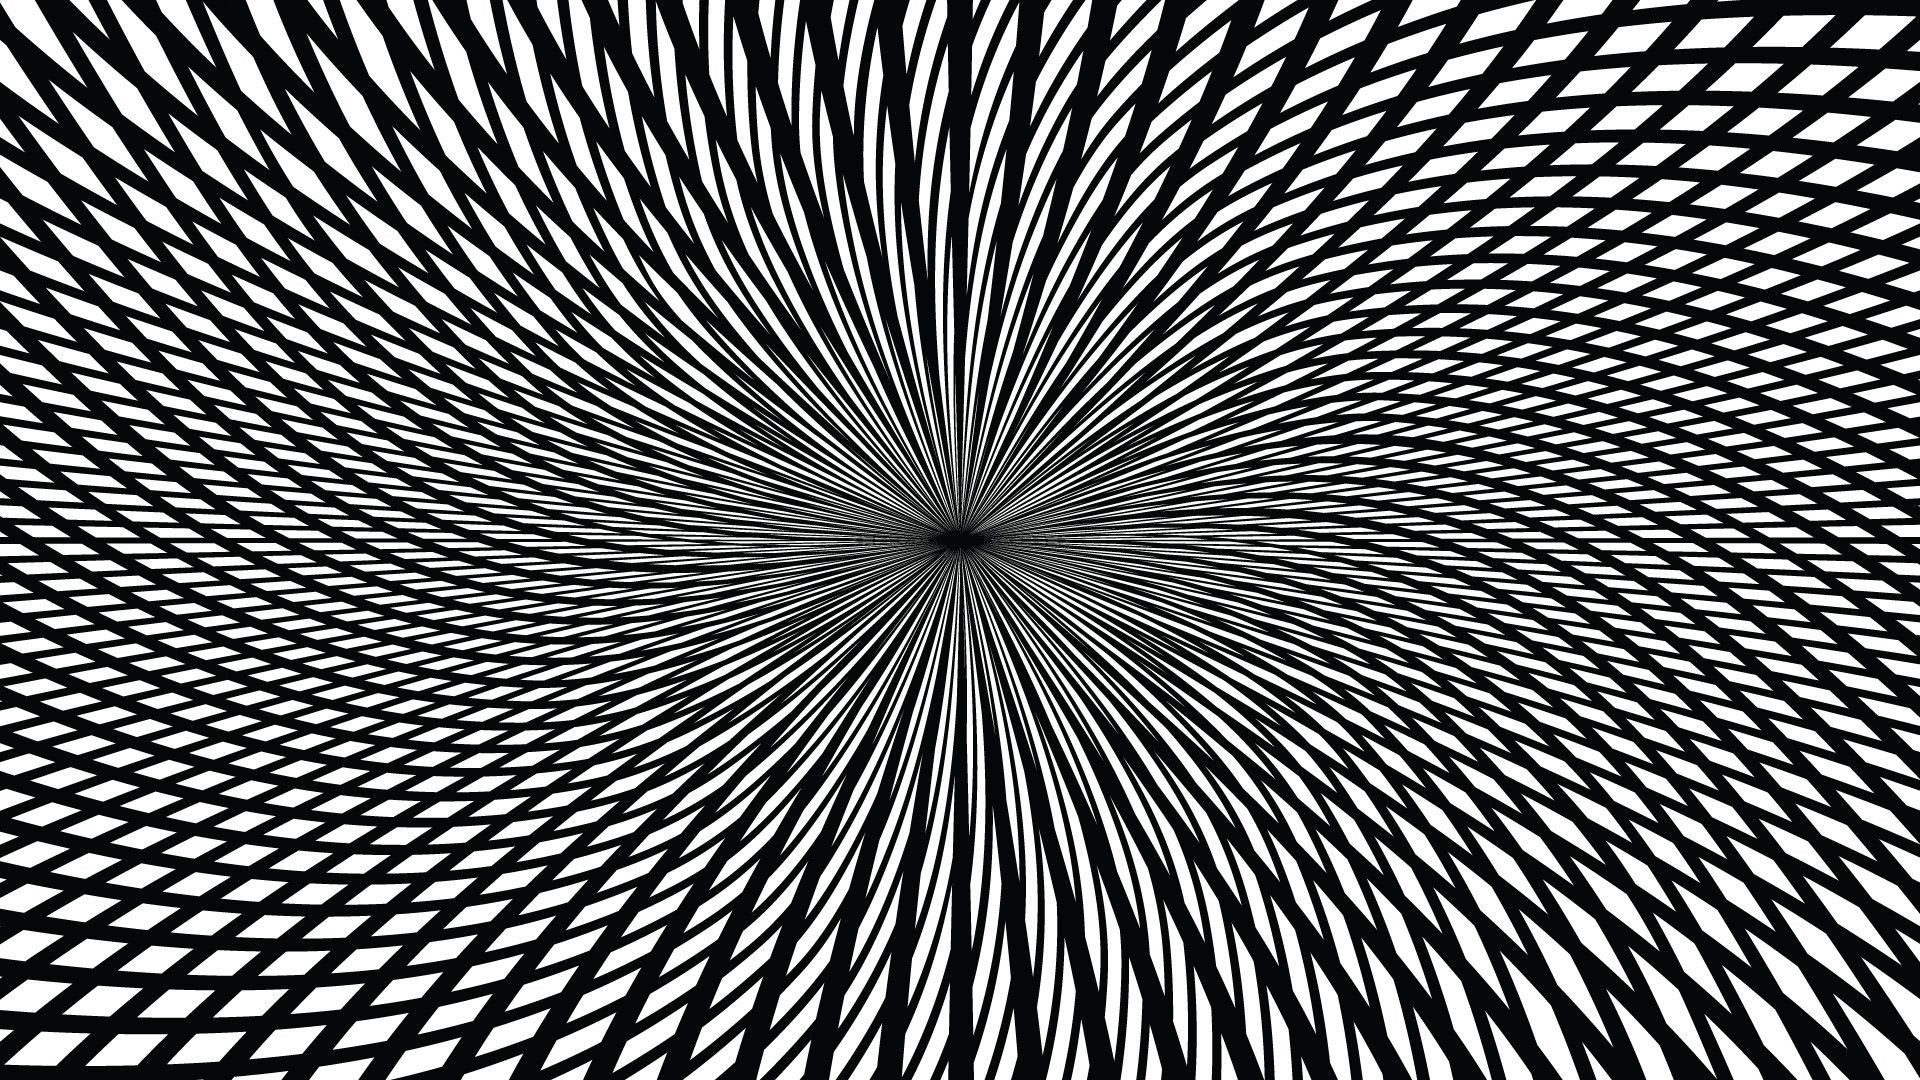 eye illusions distortion - HD1920×1080